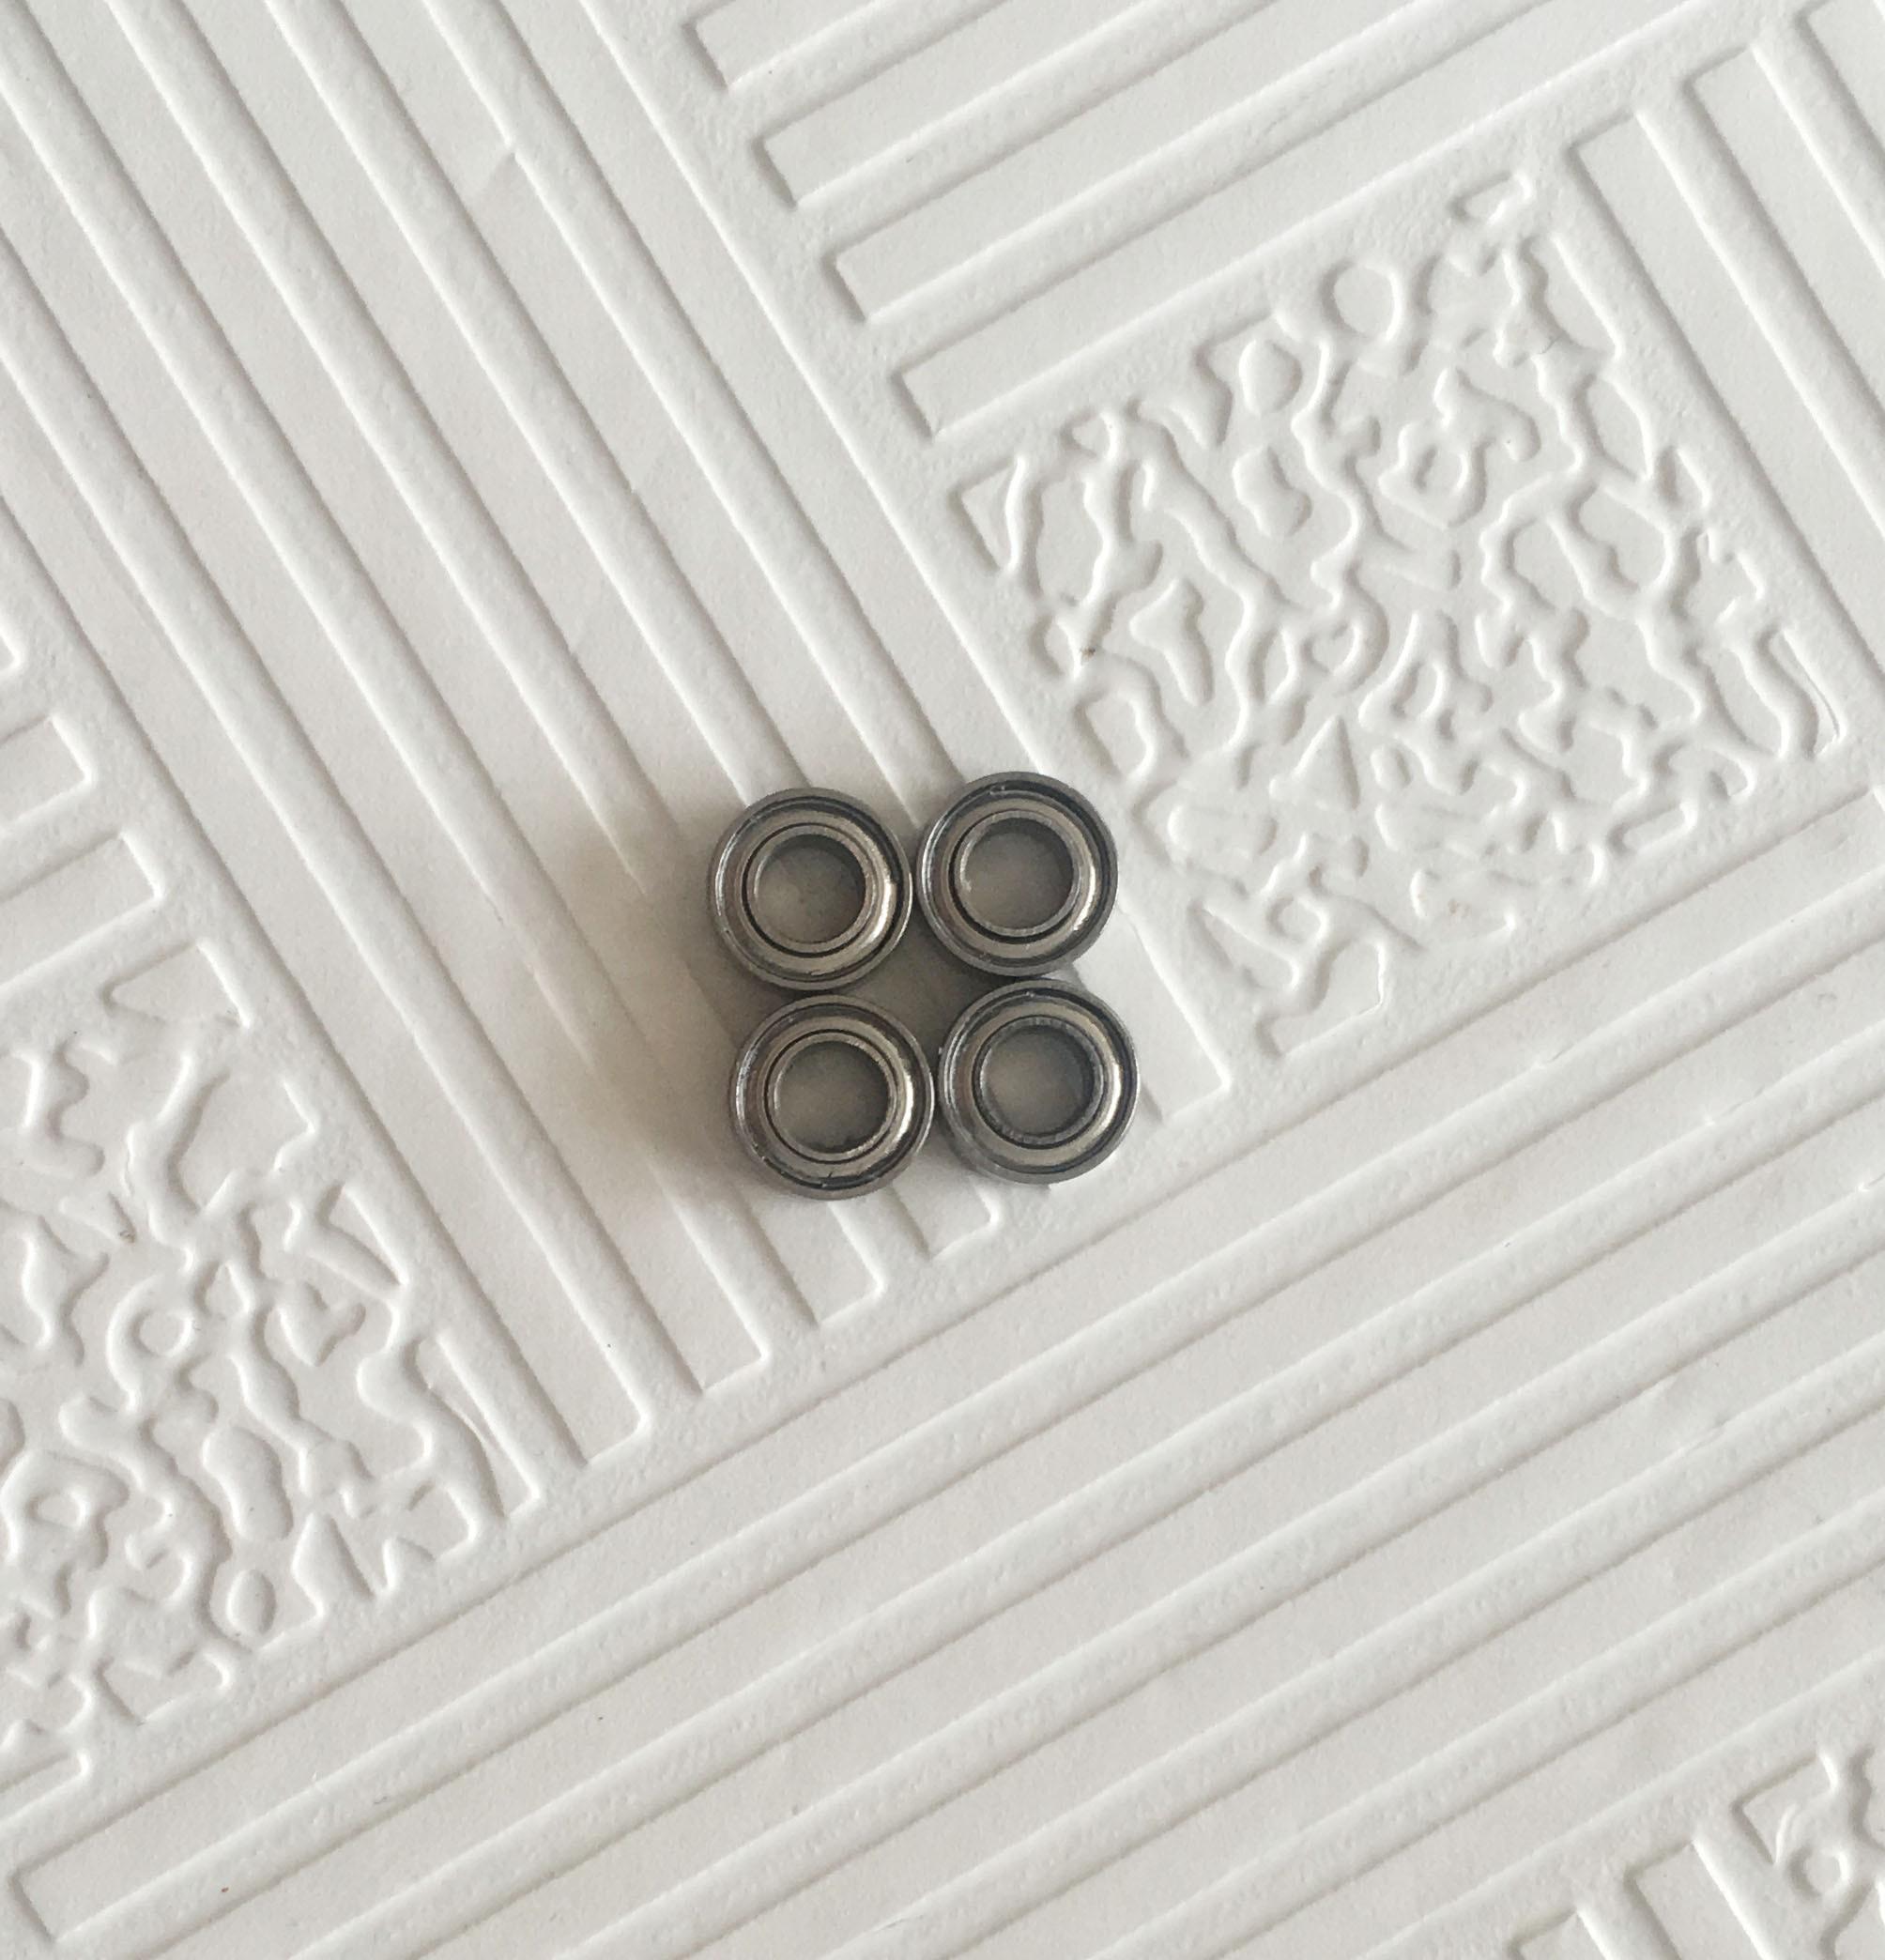 все цены на Free Shipping 2XSR2 ZZ CB Stainless Steel  Hybrid Ceramic Ball Bearings for PENN 113H, 113HL, 505HS